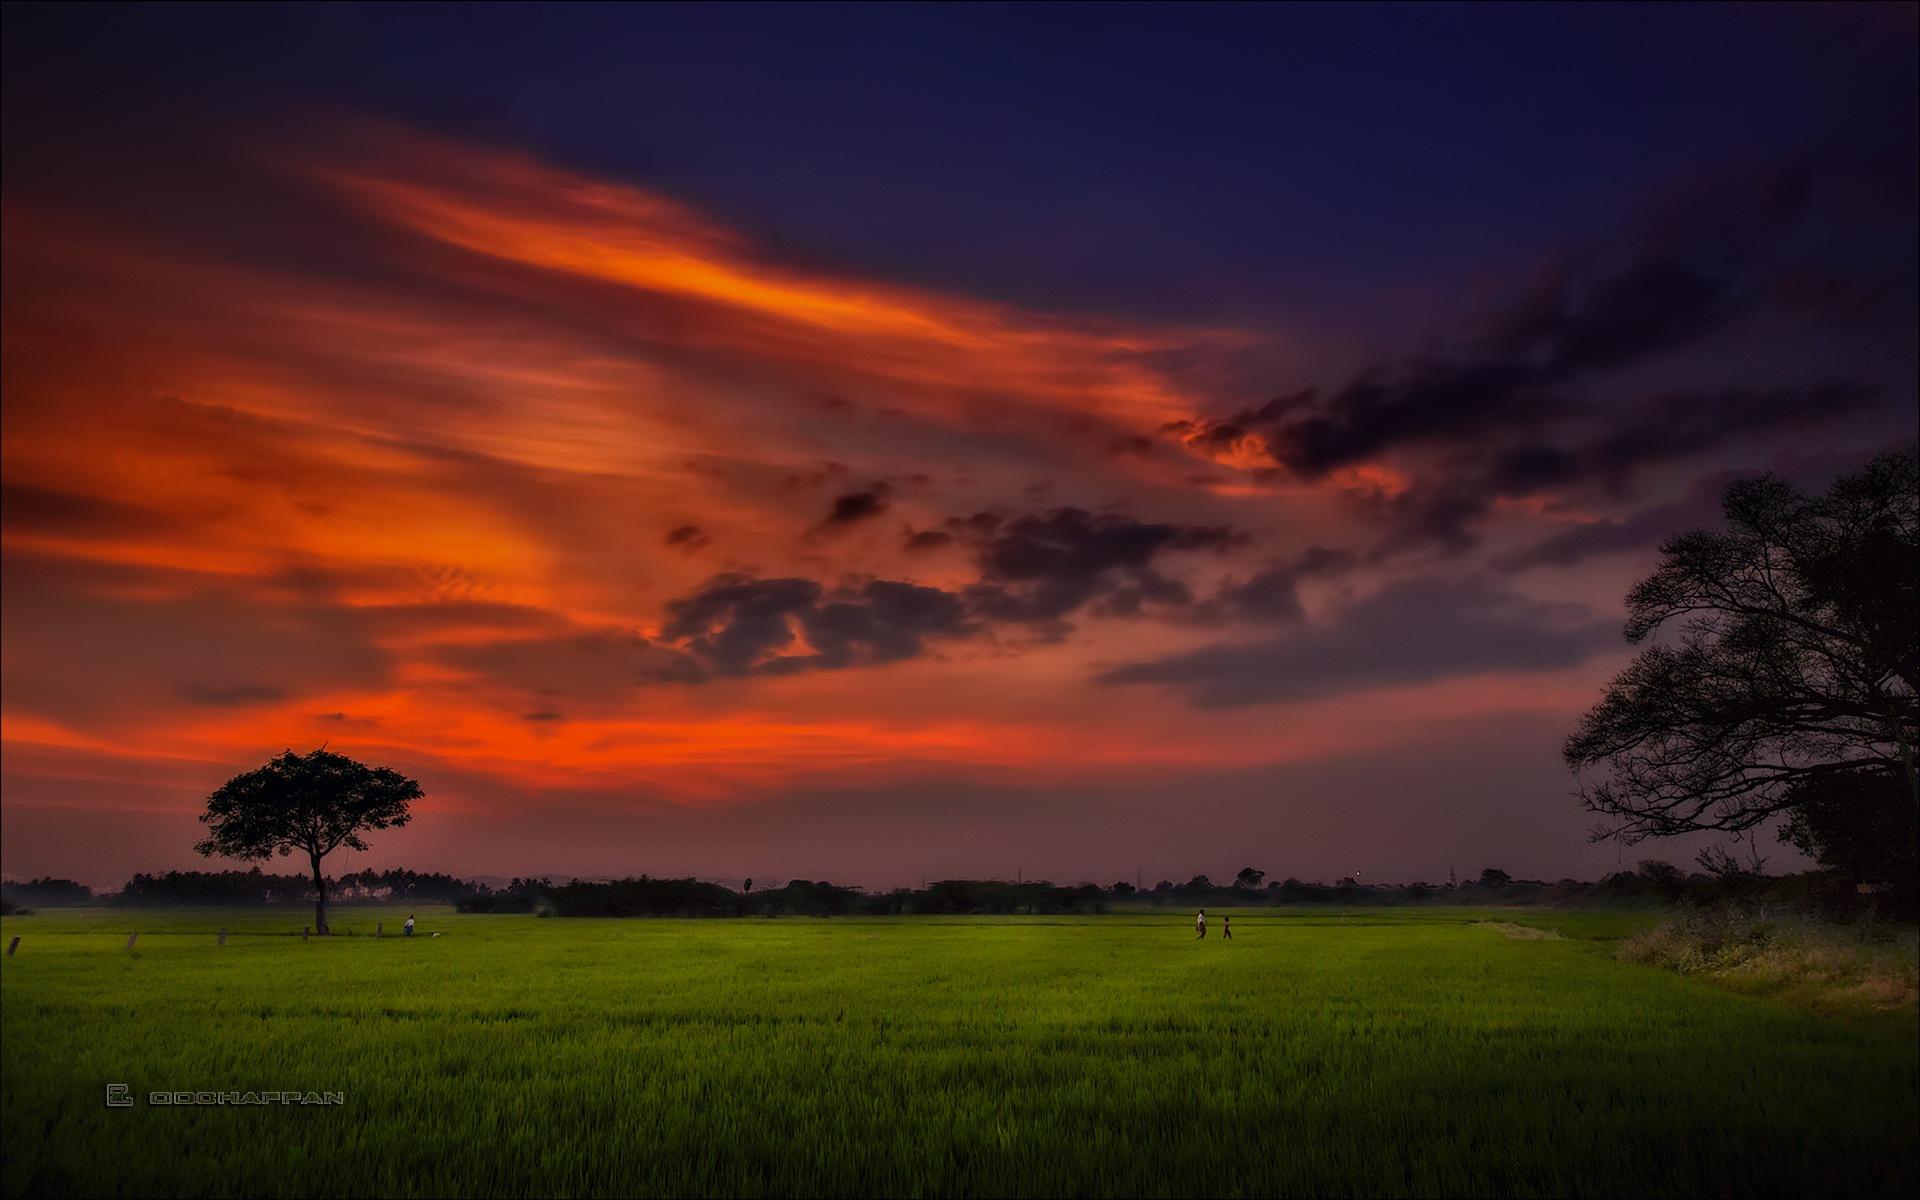 Panangadi rice field after sundown by oochappan